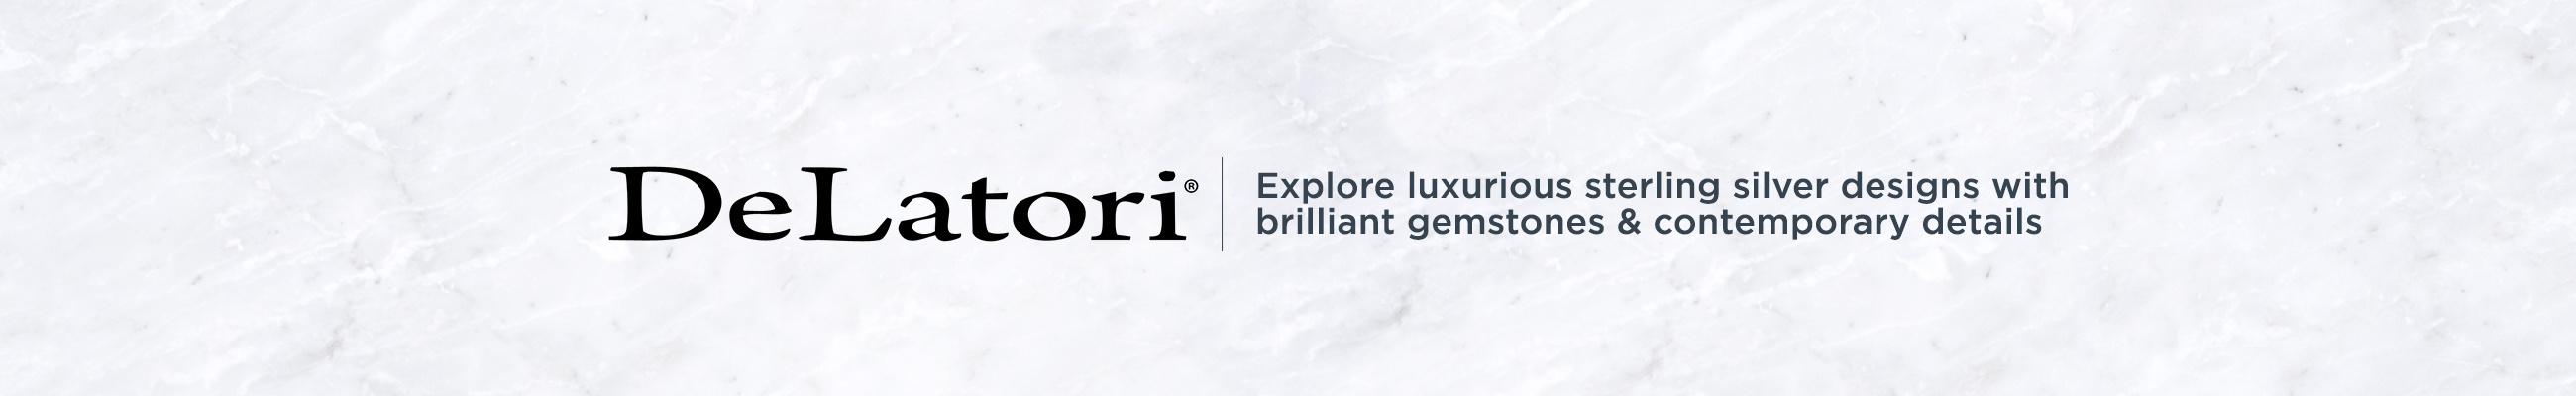 DeLatori — Explore Luxurious sterling silver designs with brilliant gemstones & contemporary details